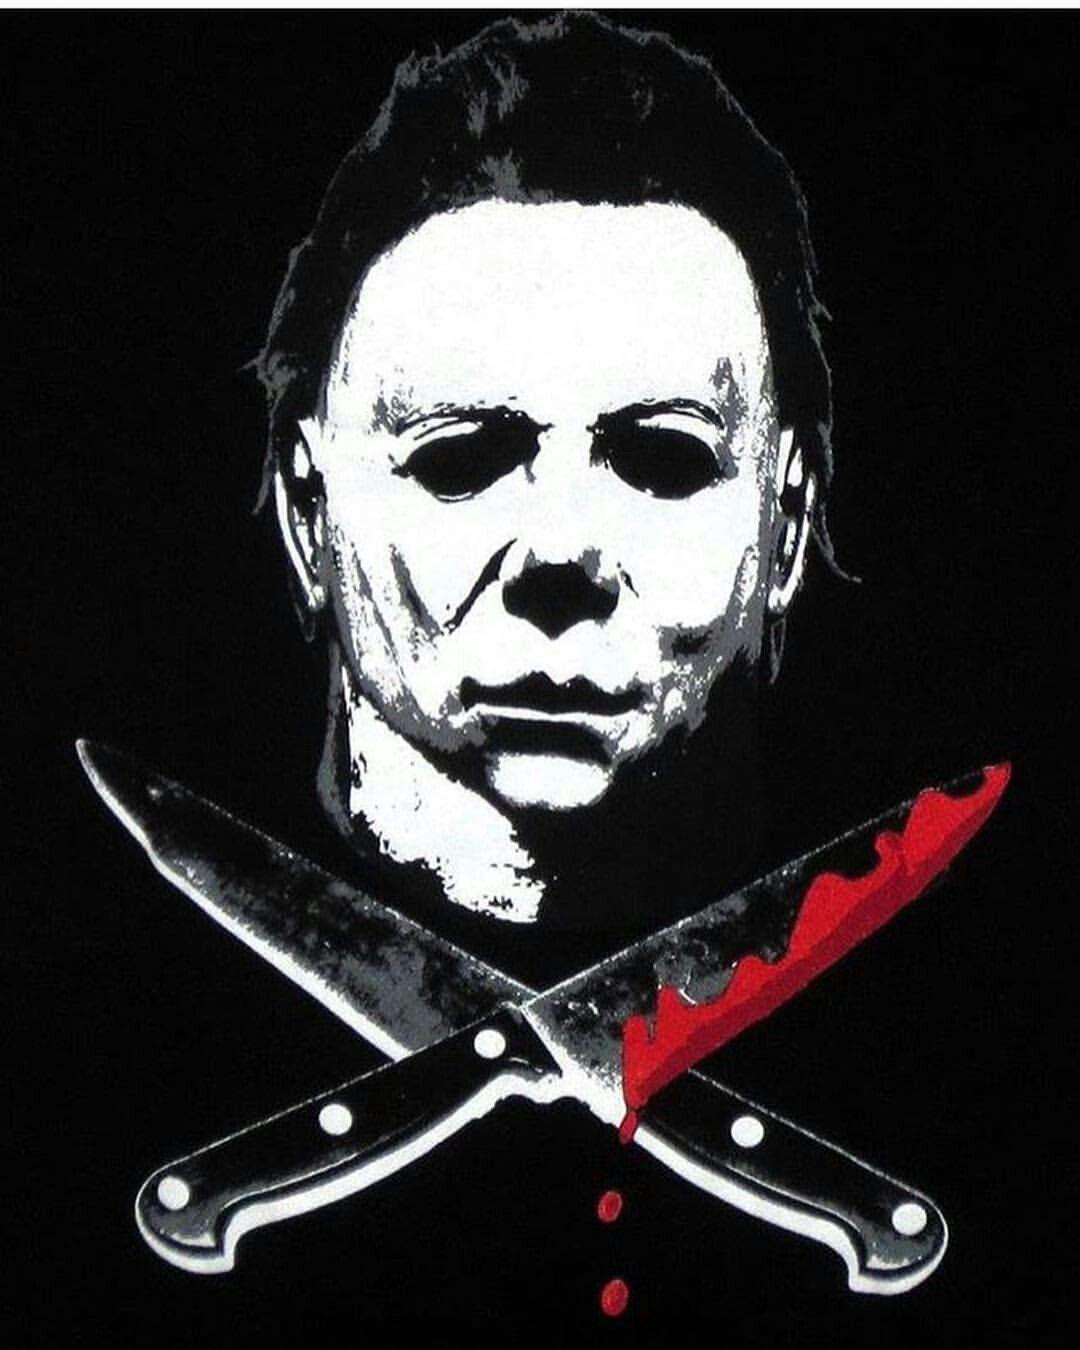 Michael Myers Halloween (the movie) Halloween (the